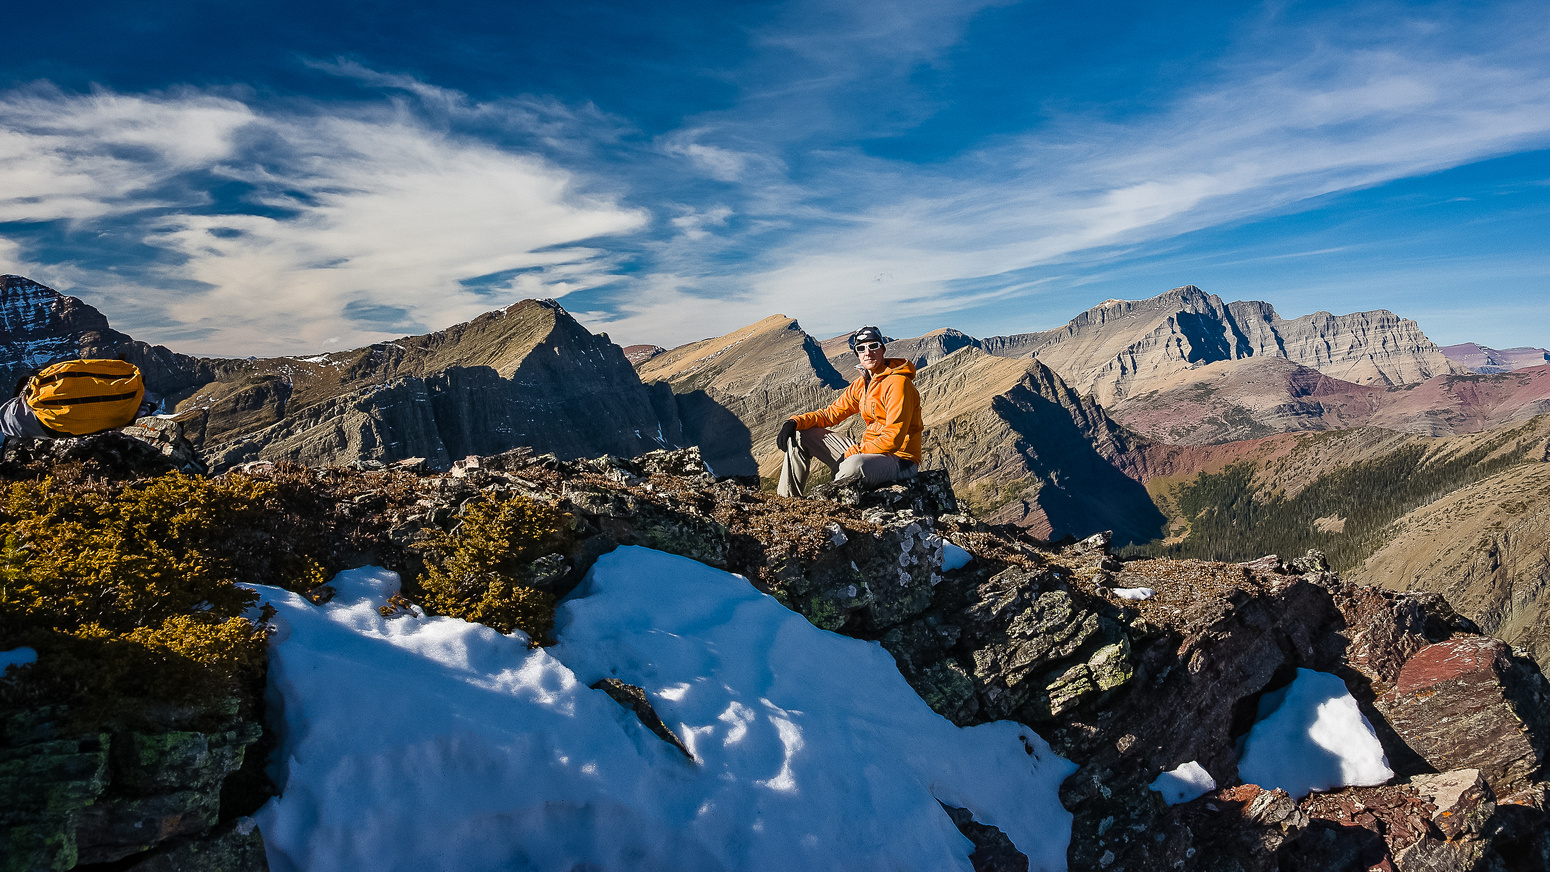 On the west ridge of Bertha Peak.